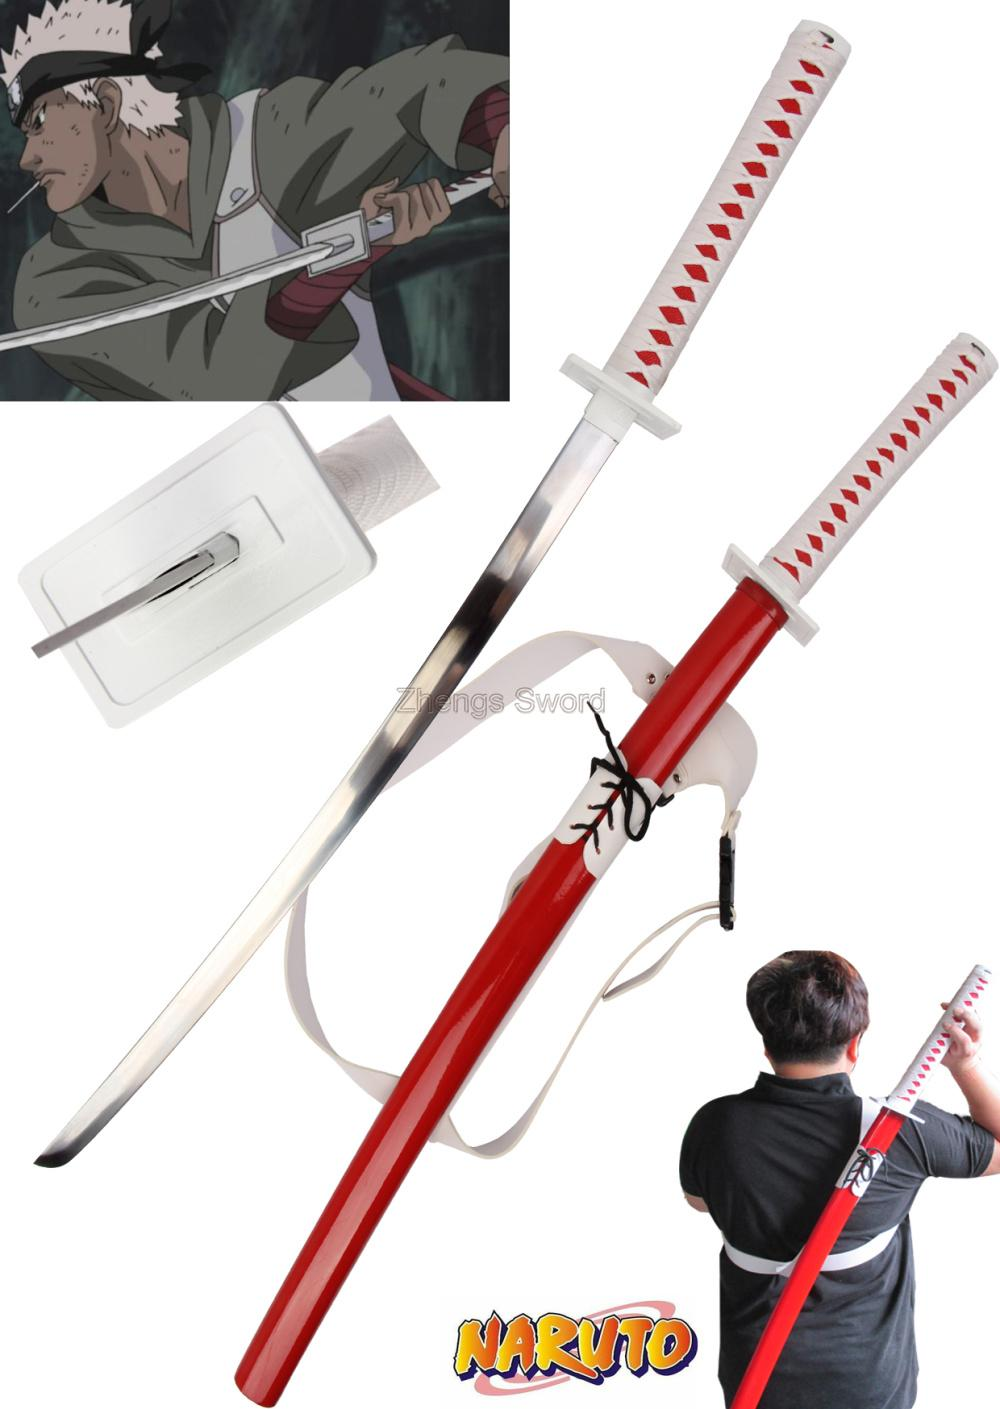 how to make saska sword from naruto